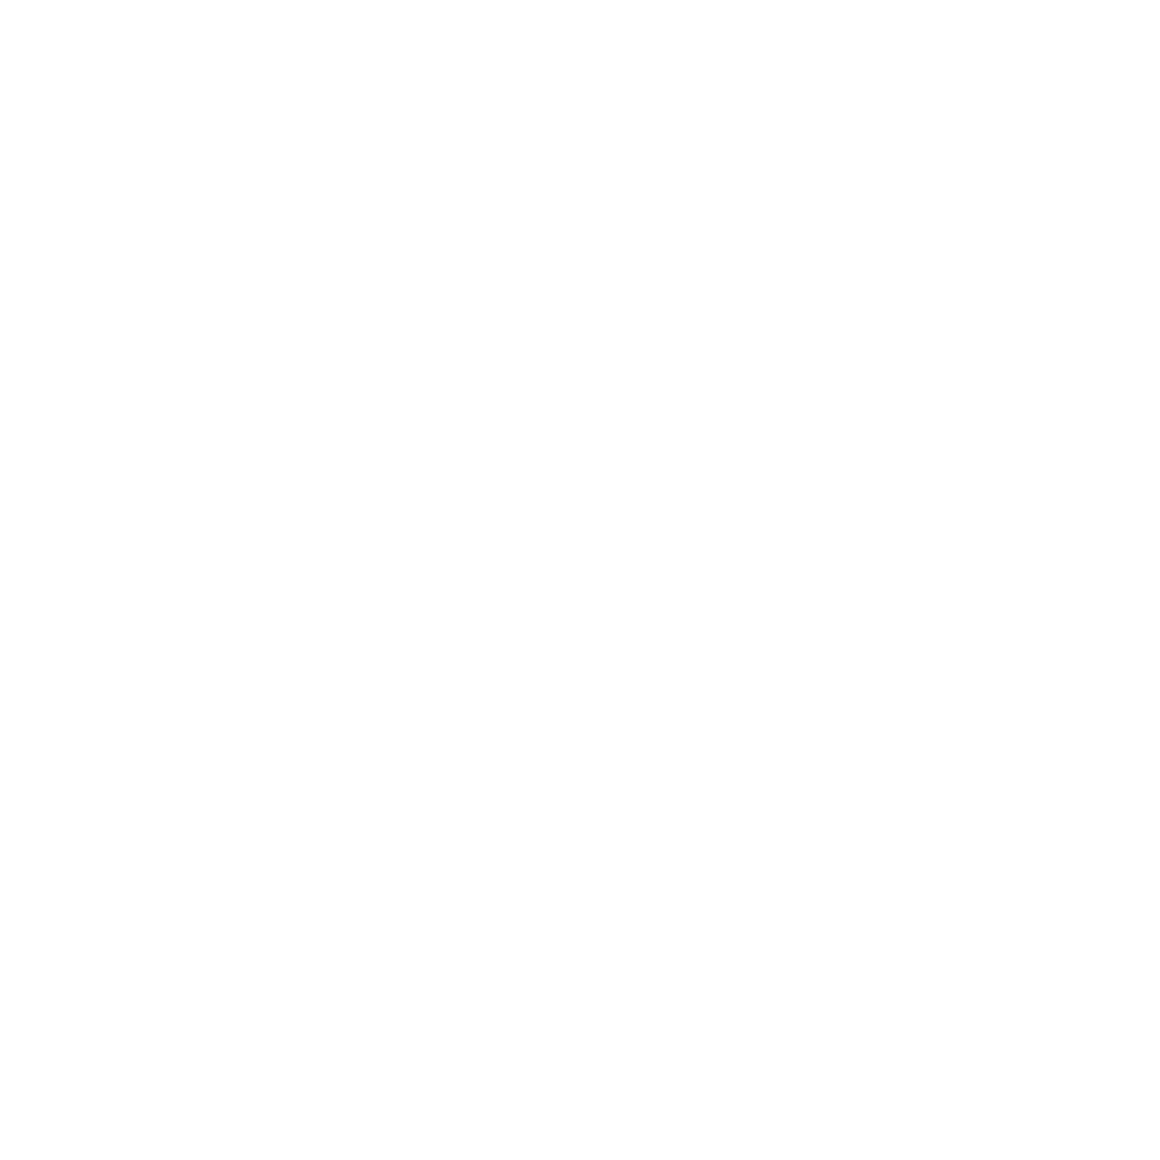 gelatin plate monoprint